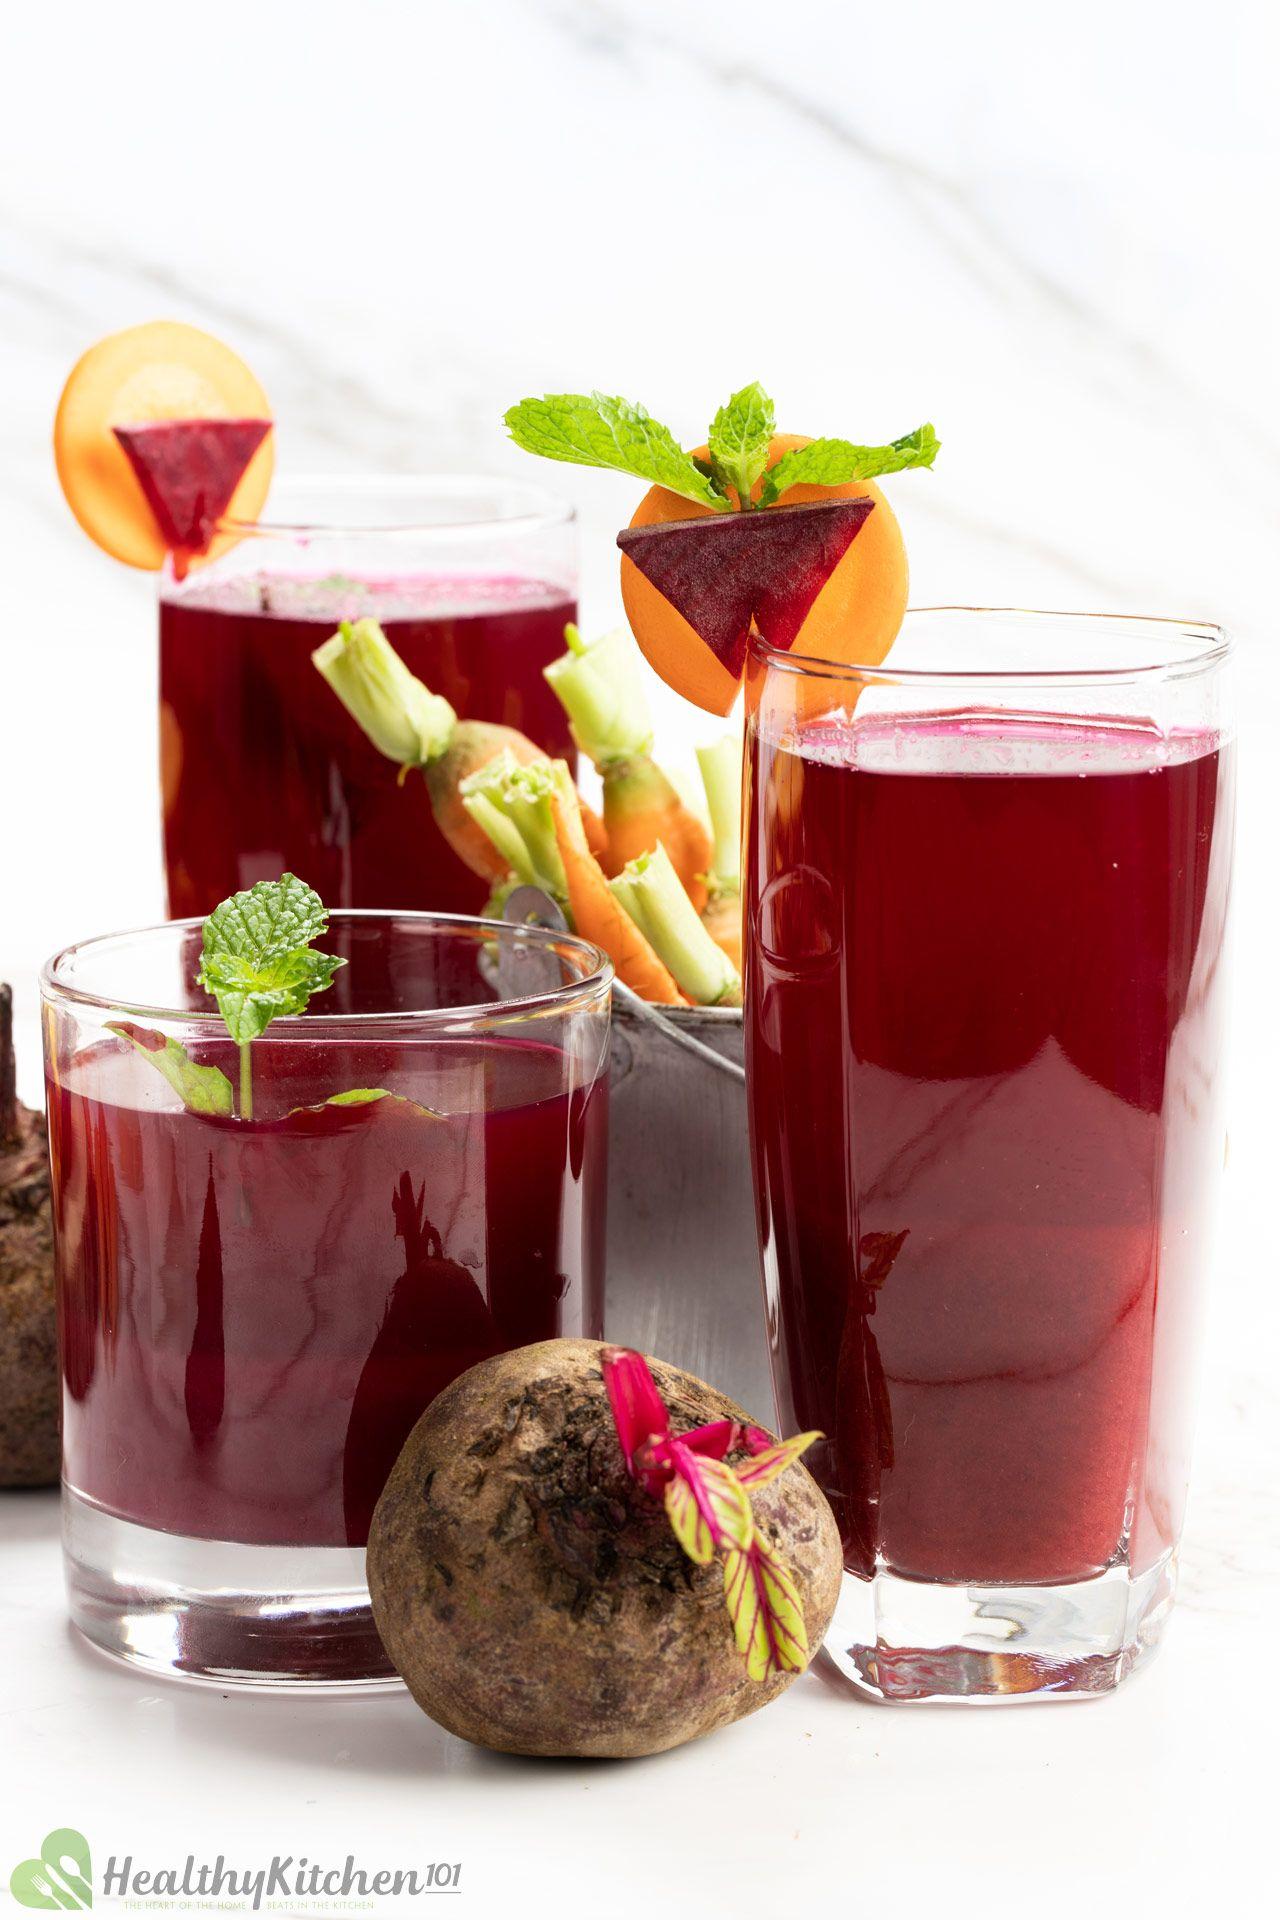 Can I Drink beet Juice While Taking Blood Pressure Medication